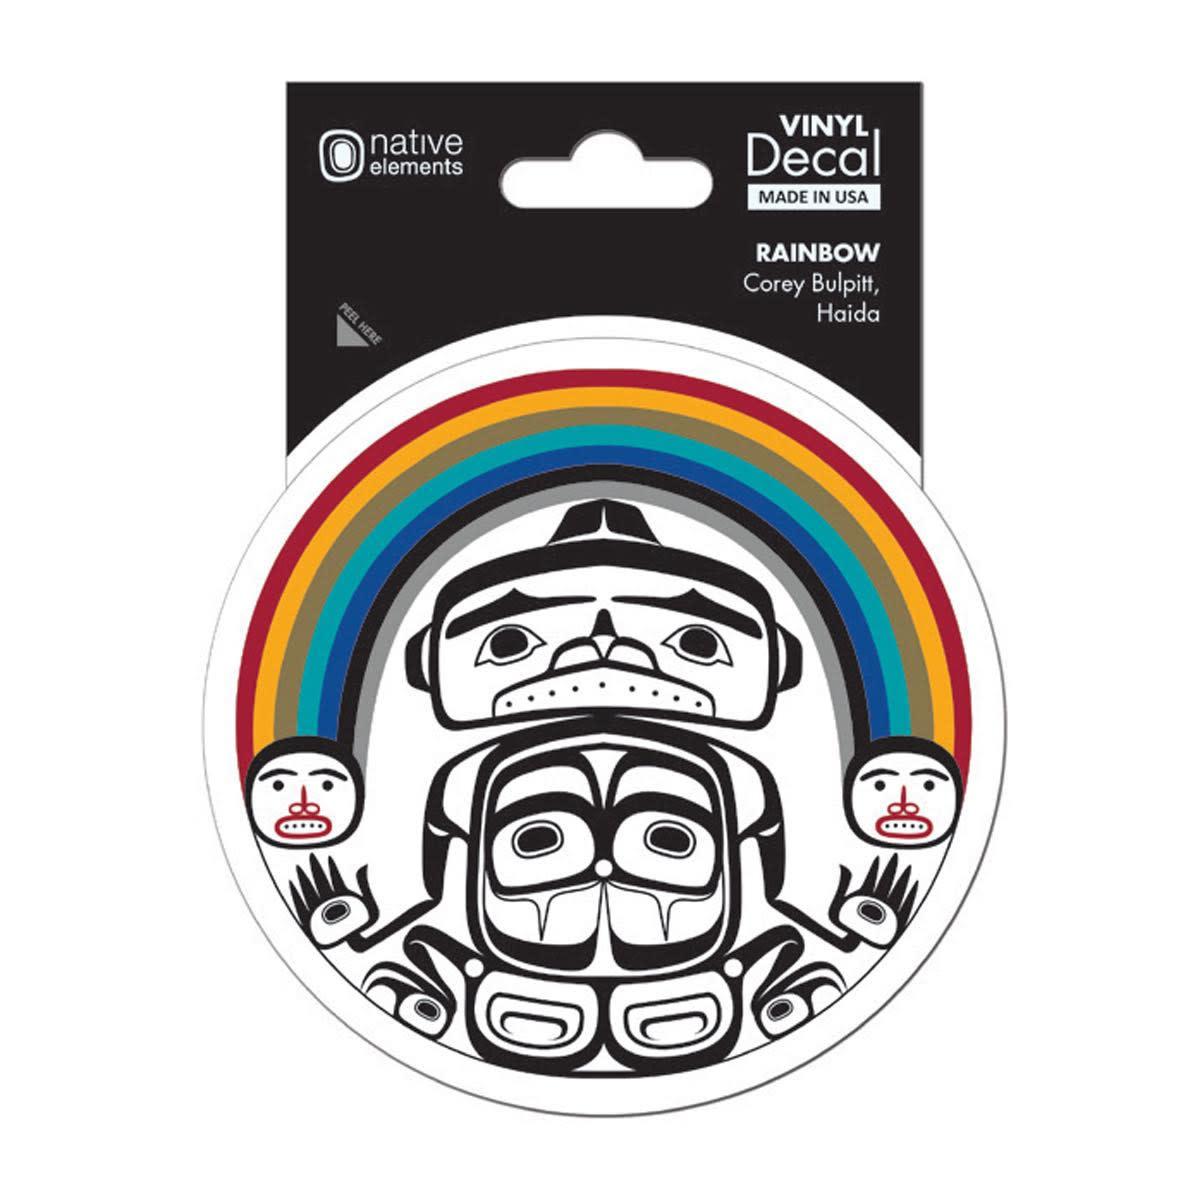 Premium Decal - Rainbow by Corey Bulpitt-1